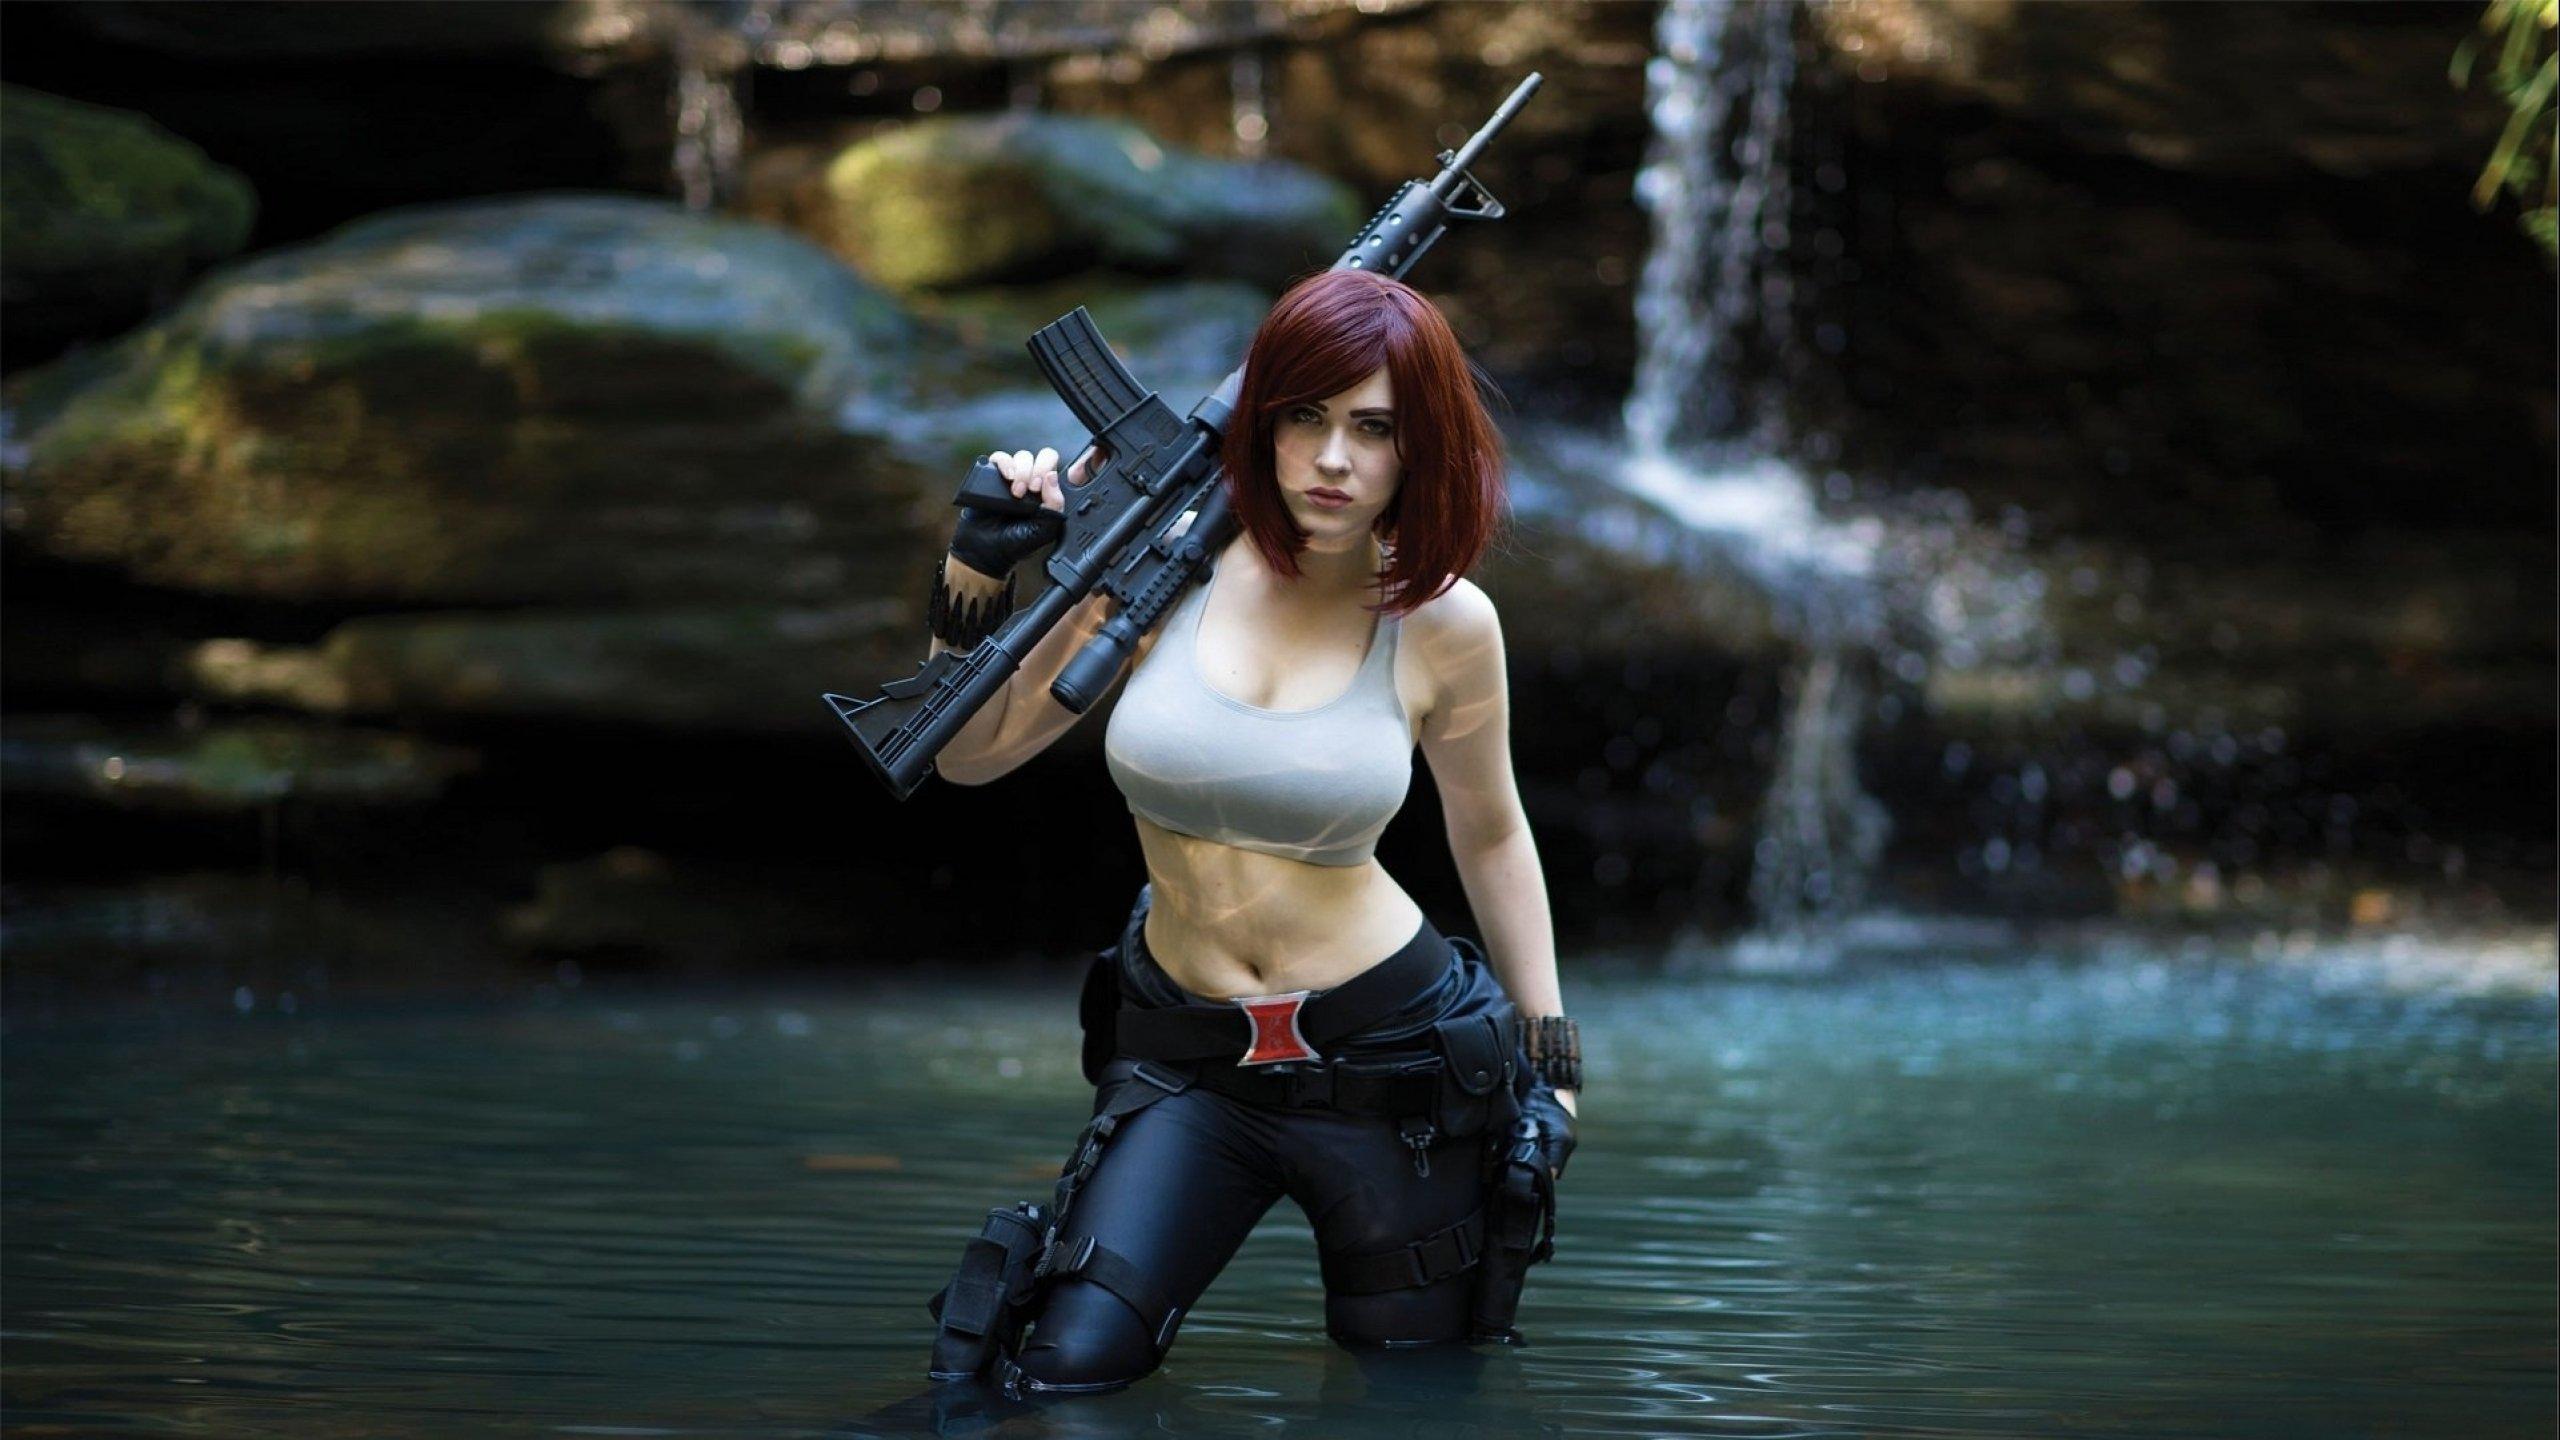 Love Asian girl gun wallpaper love